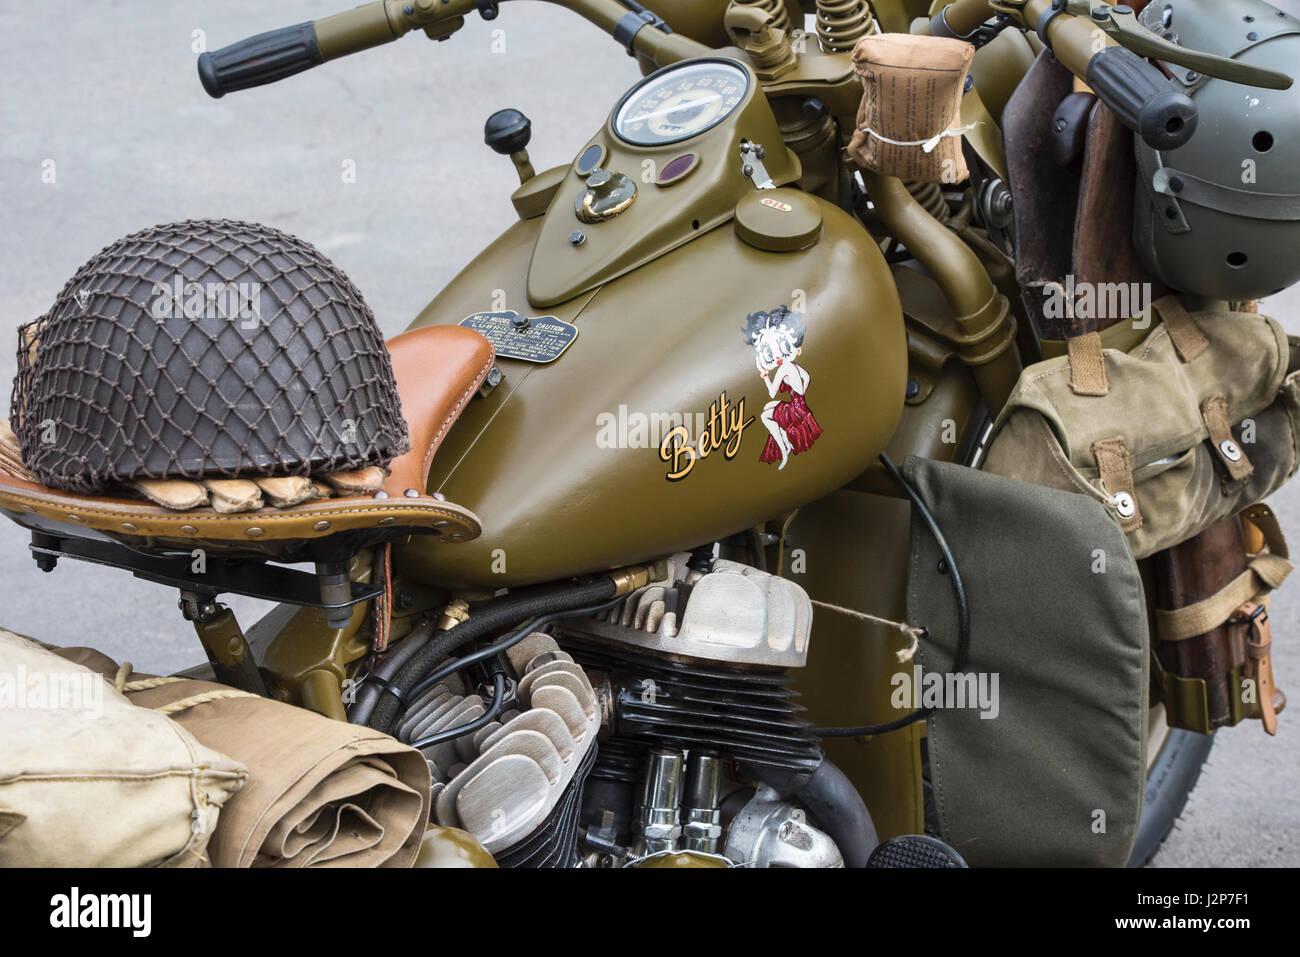 Harley Davidson Army: 1942 Vintage Harley Davidson Military Model 42WLC